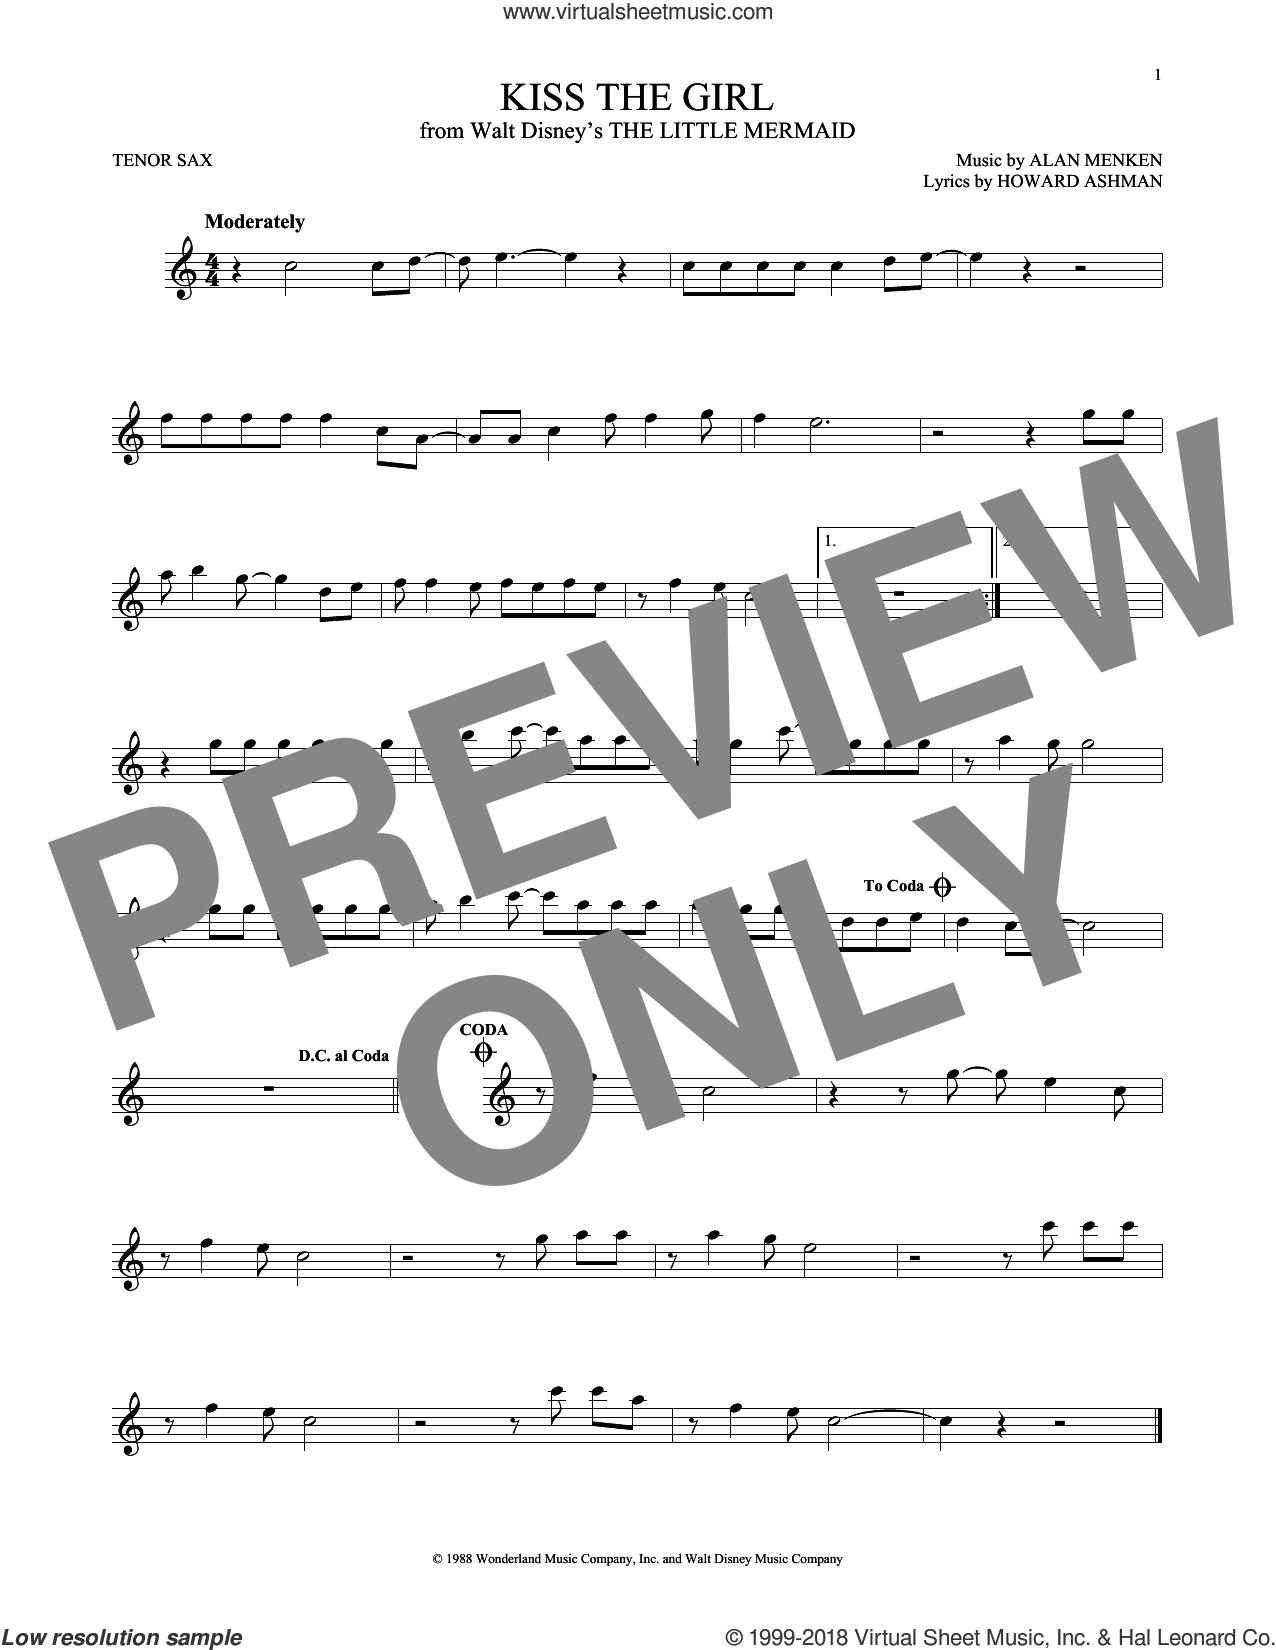 Kiss The Girl (from The Little Mermaid) sheet music for tenor saxophone solo by Alan Menken, Little Texas, Alan Menken & Howard Ashman and Howard Ashman, intermediate skill level